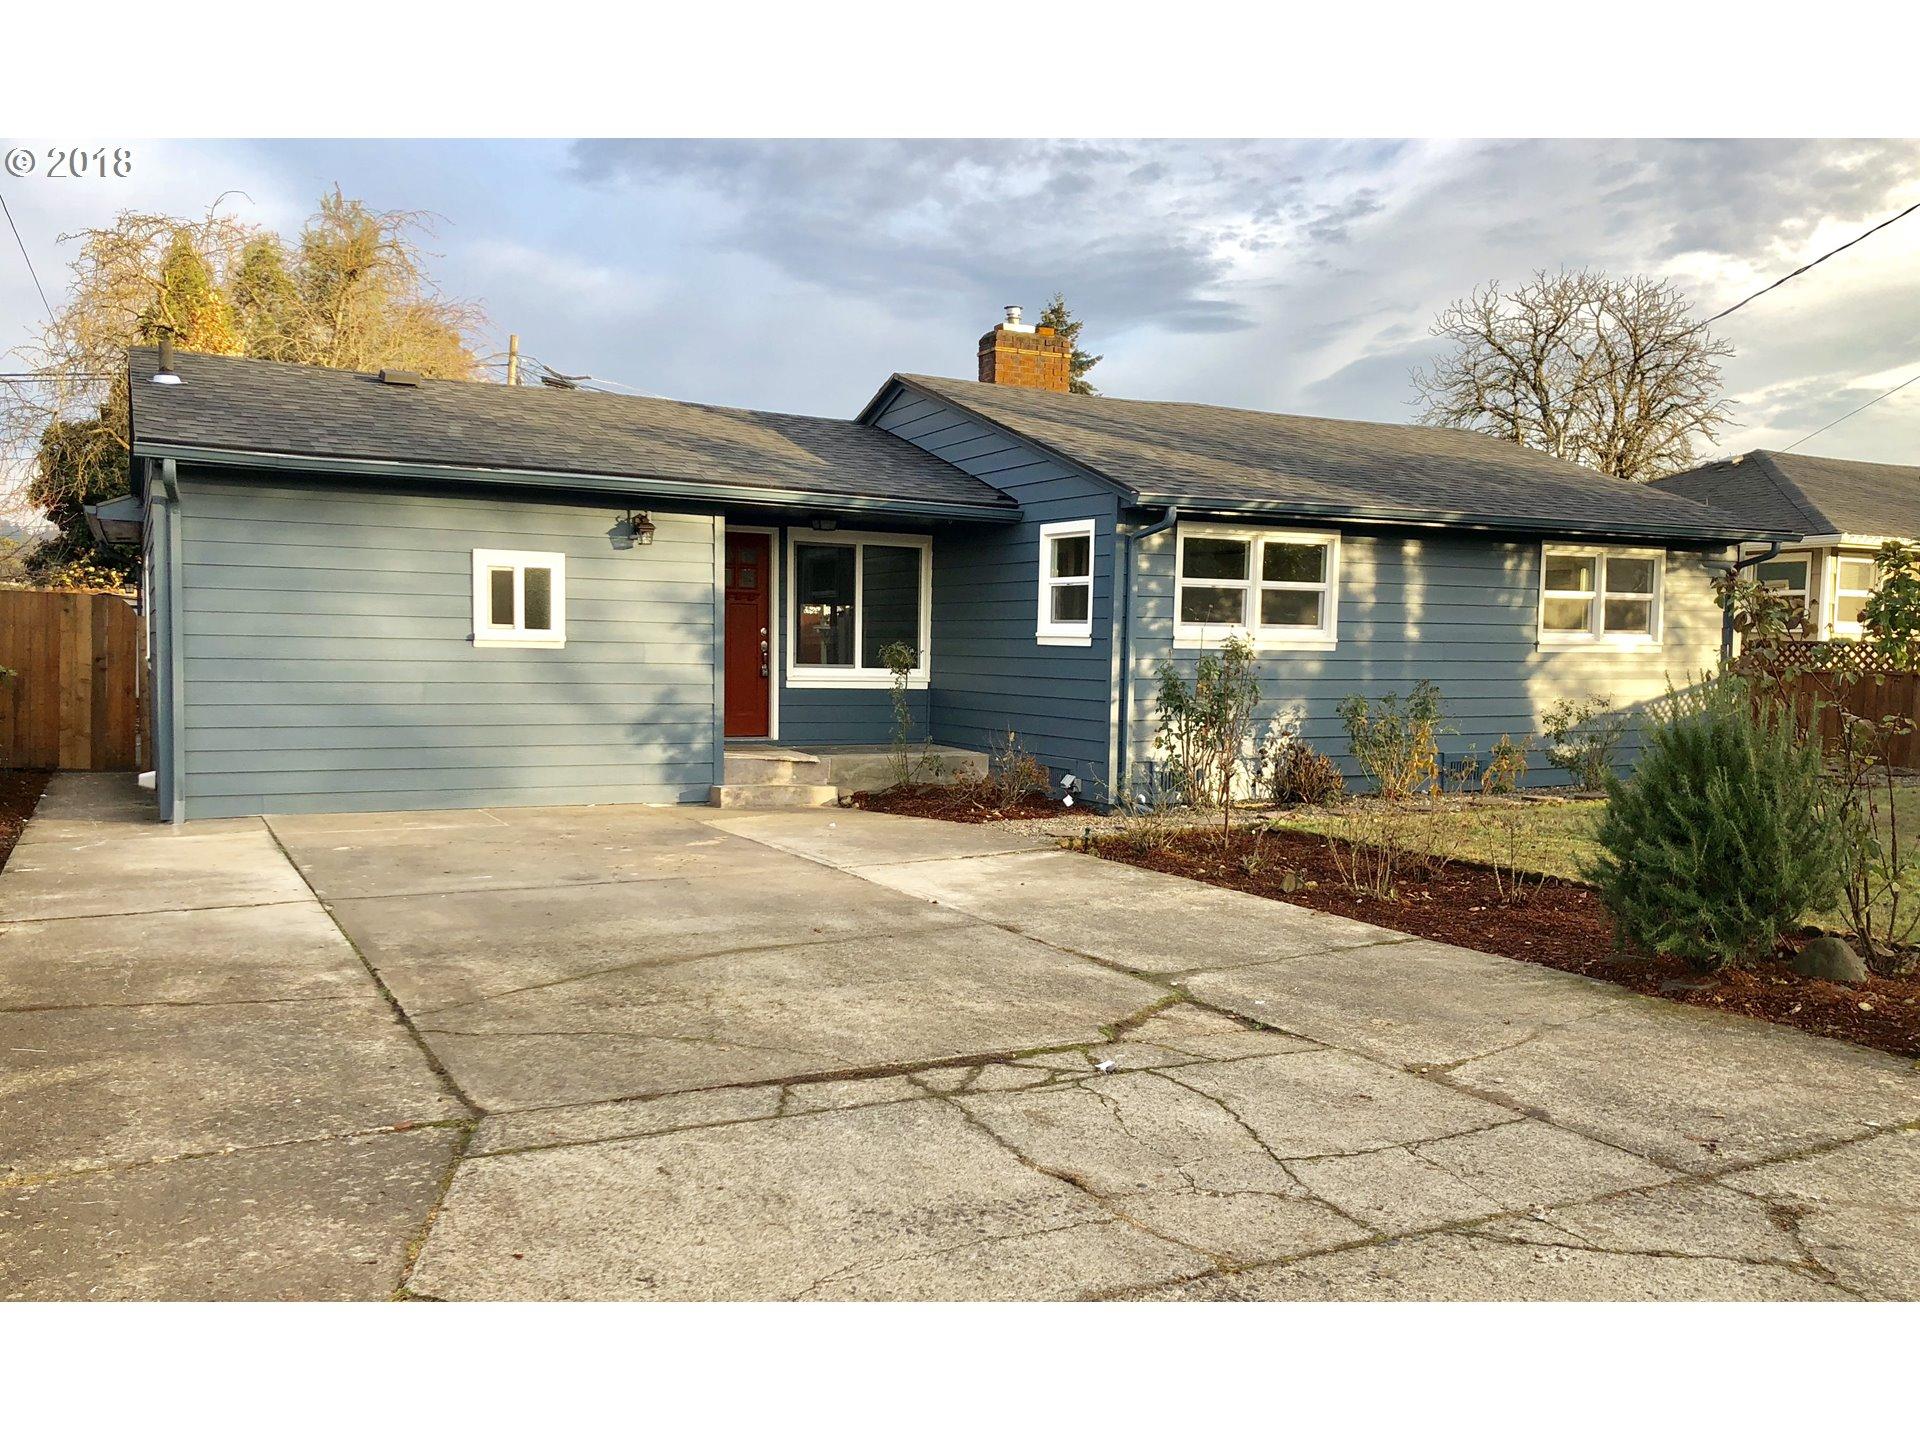 2915 PEARL ST Eugene, OR 97405 - MLS #: 18140132